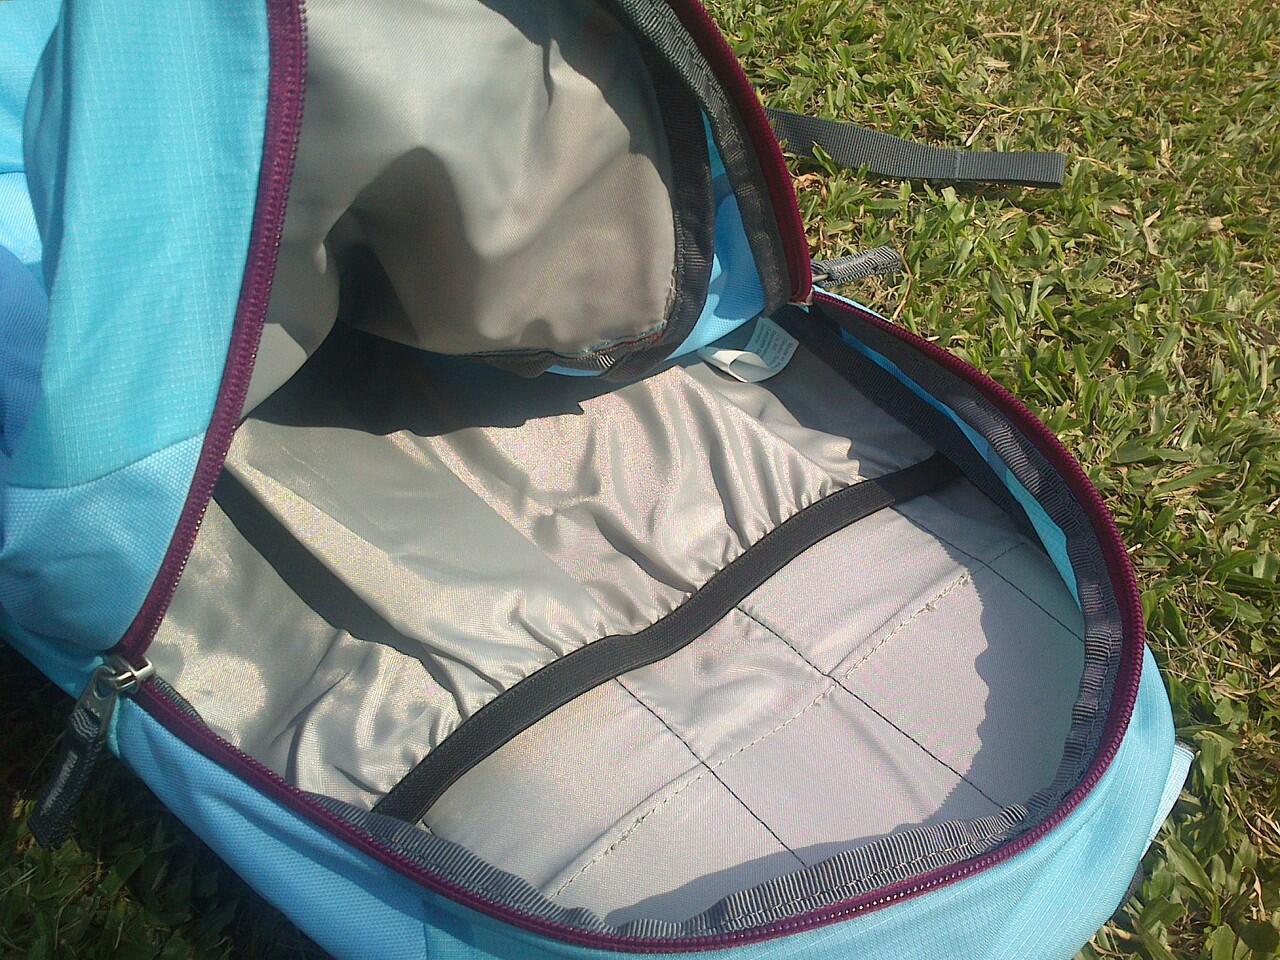 jual daypack DEUTER ZEA 22L & cover bag EIGER 45L